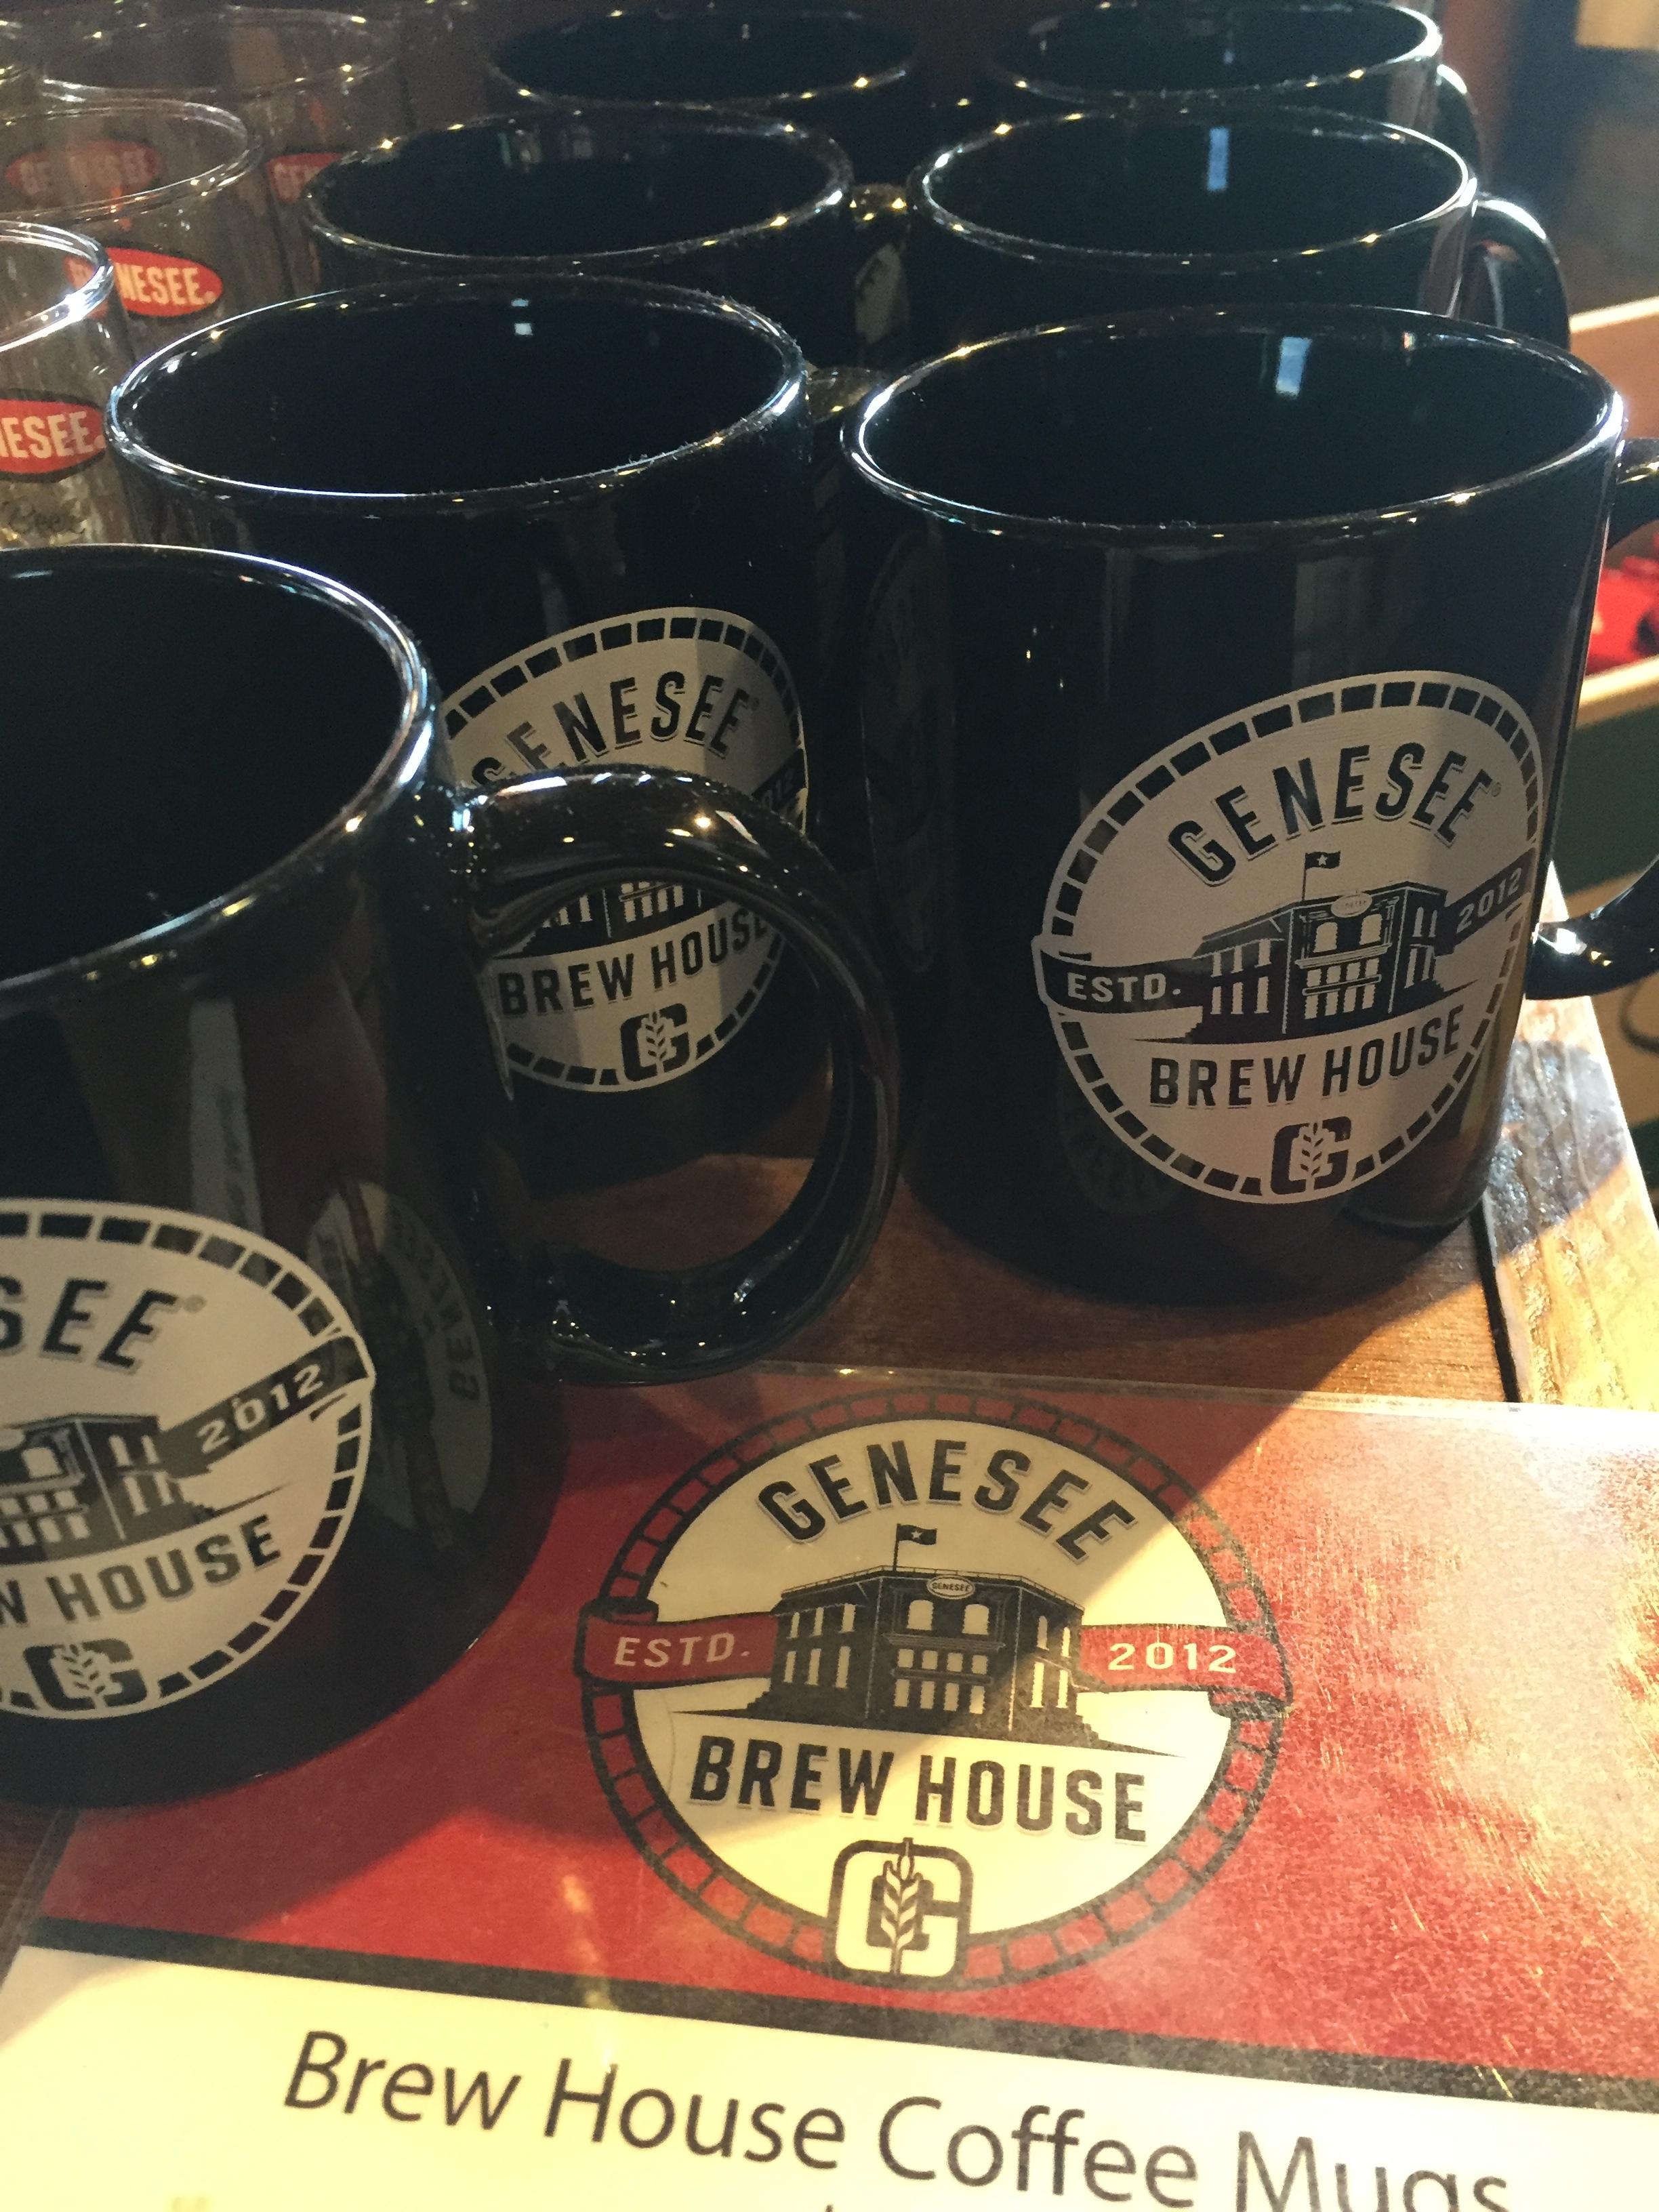 Genesee Brew House Coffee Mugs